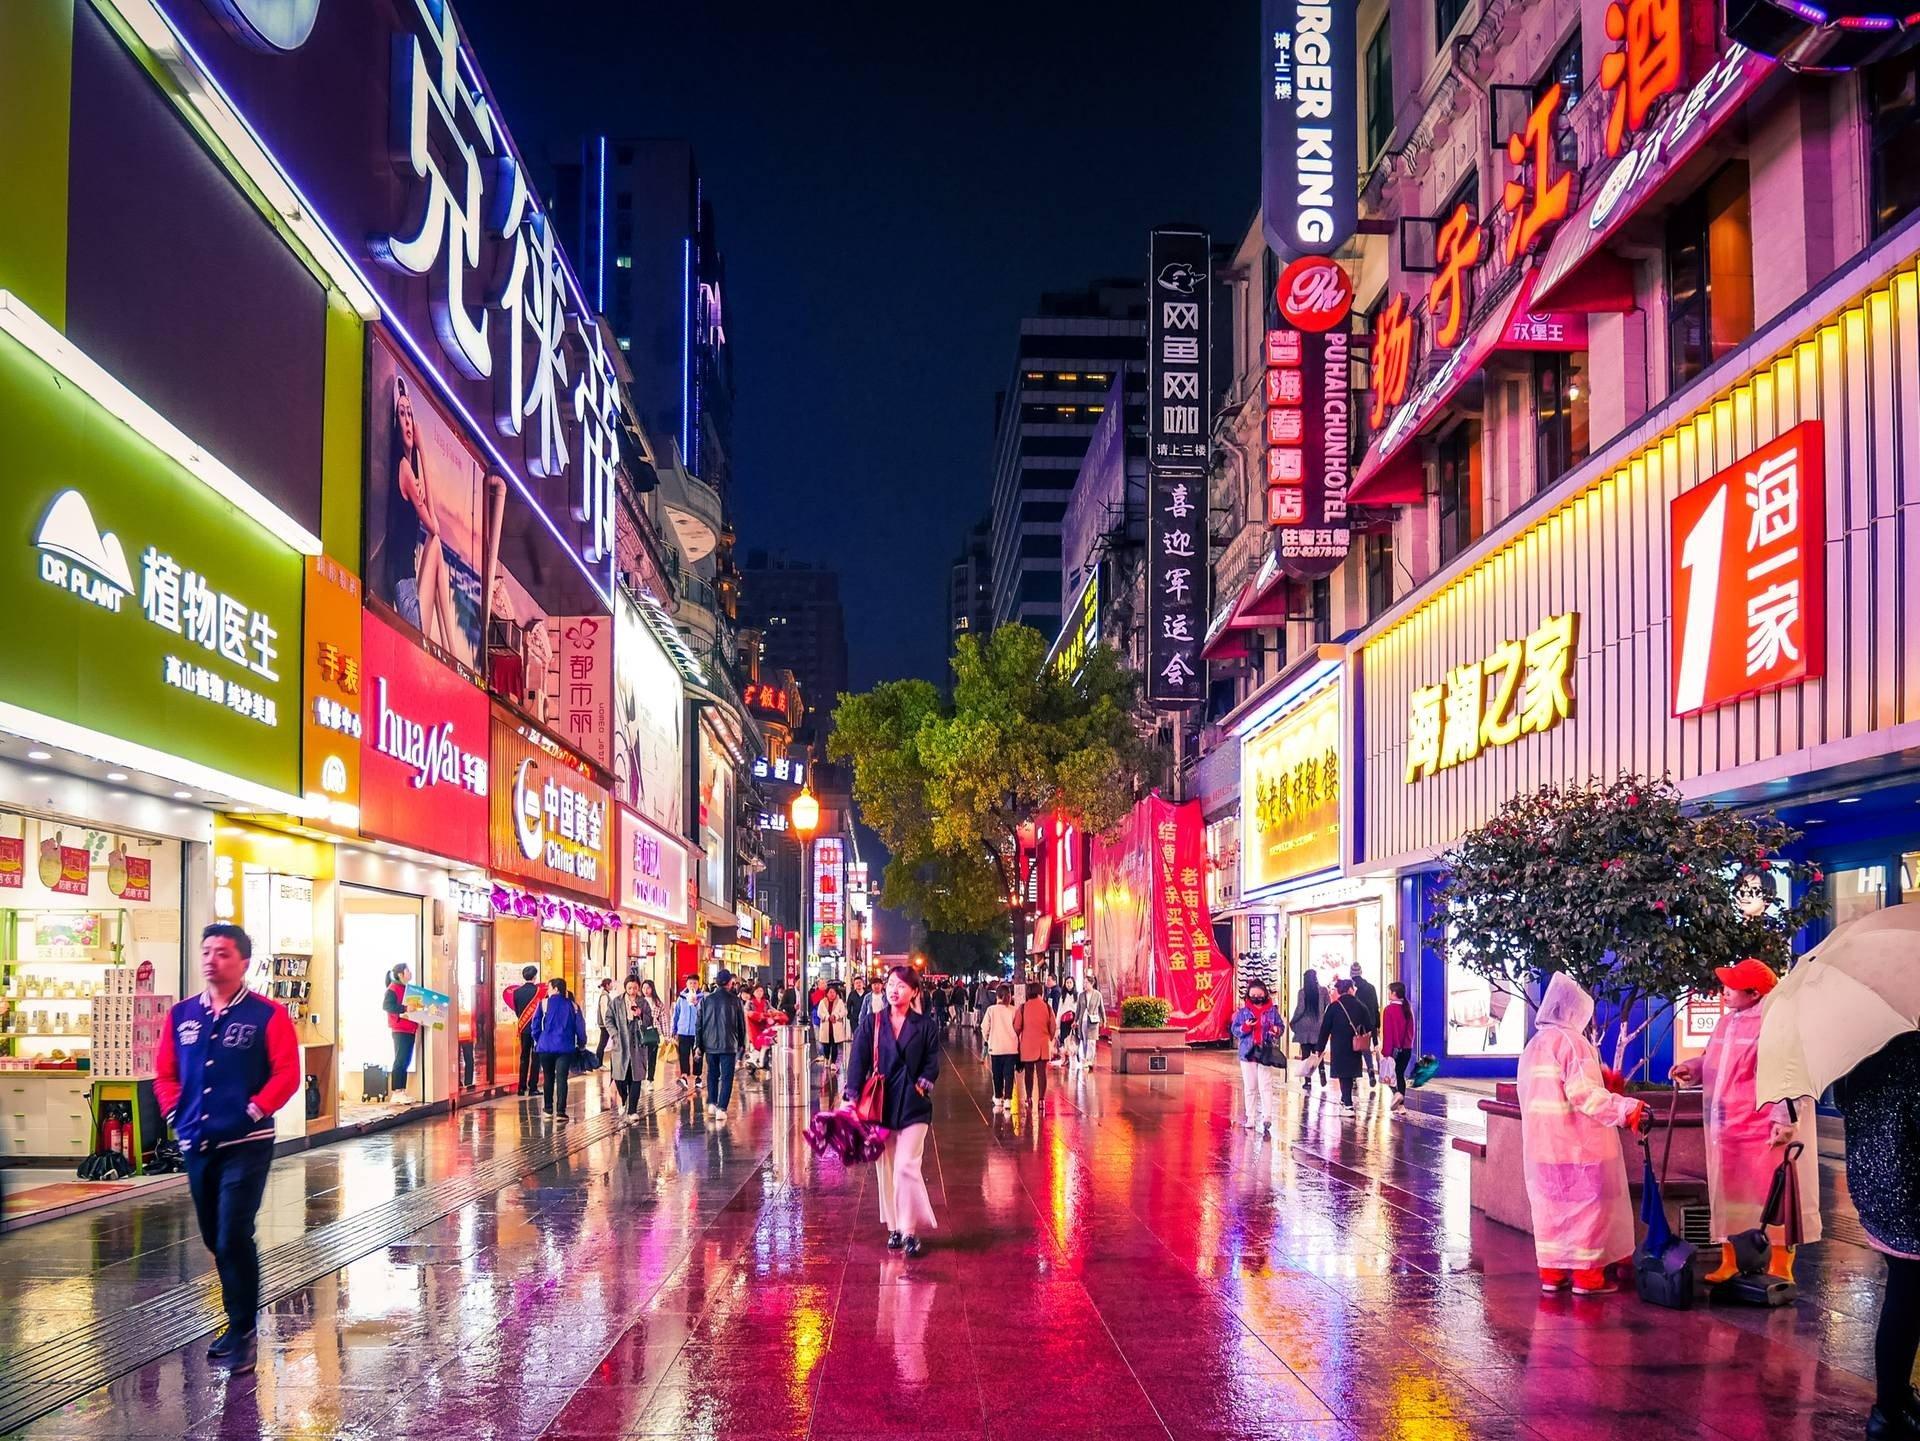 Jianghan walking street